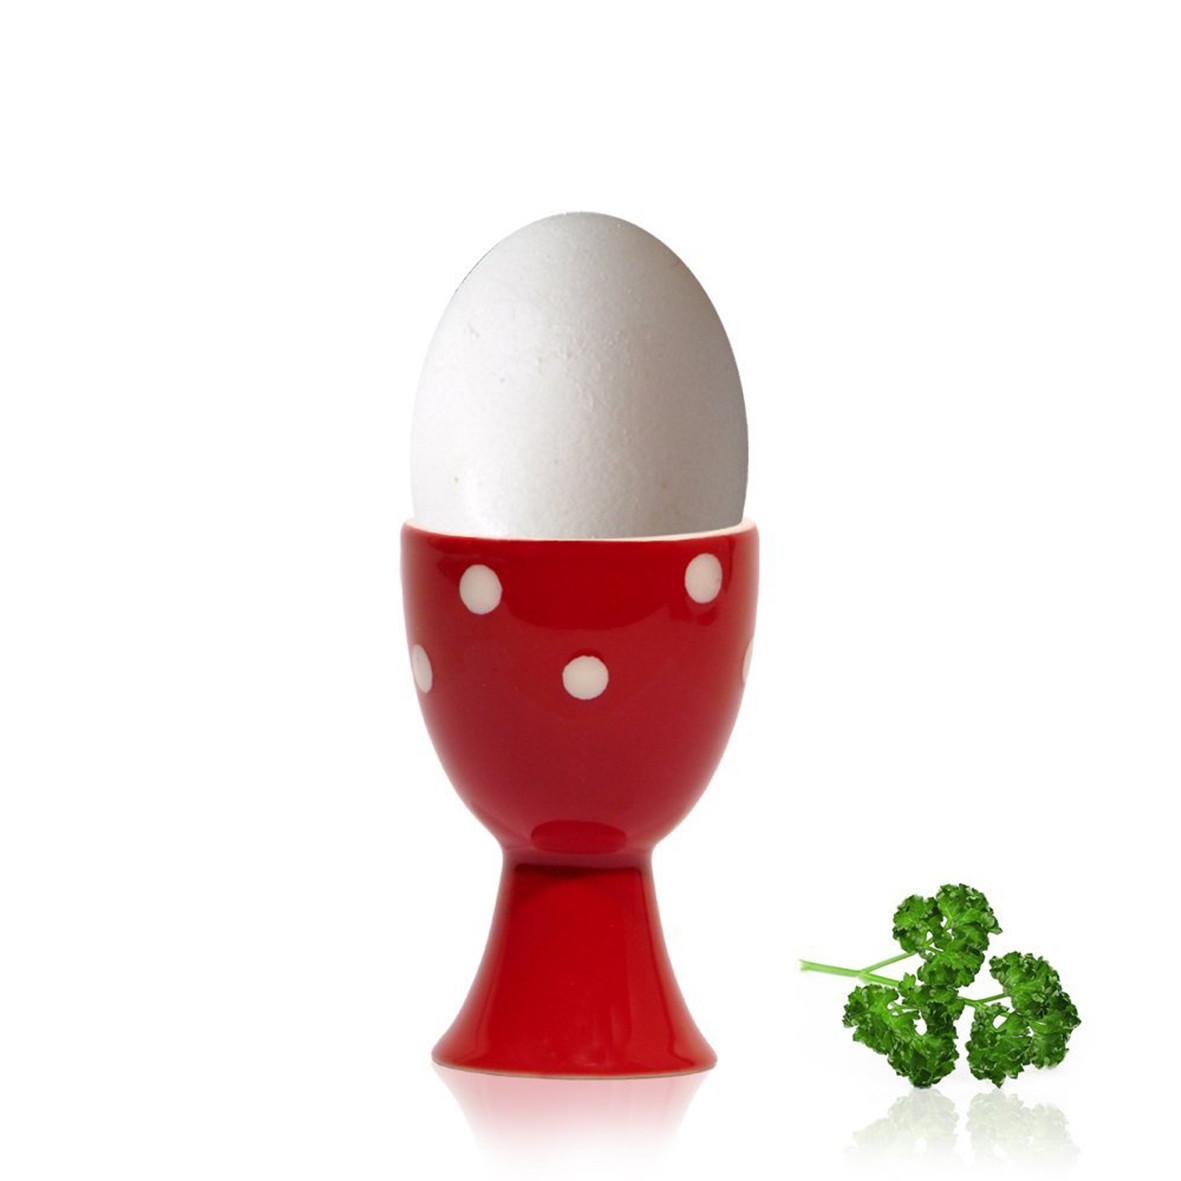 Eierbecher ohne Logo